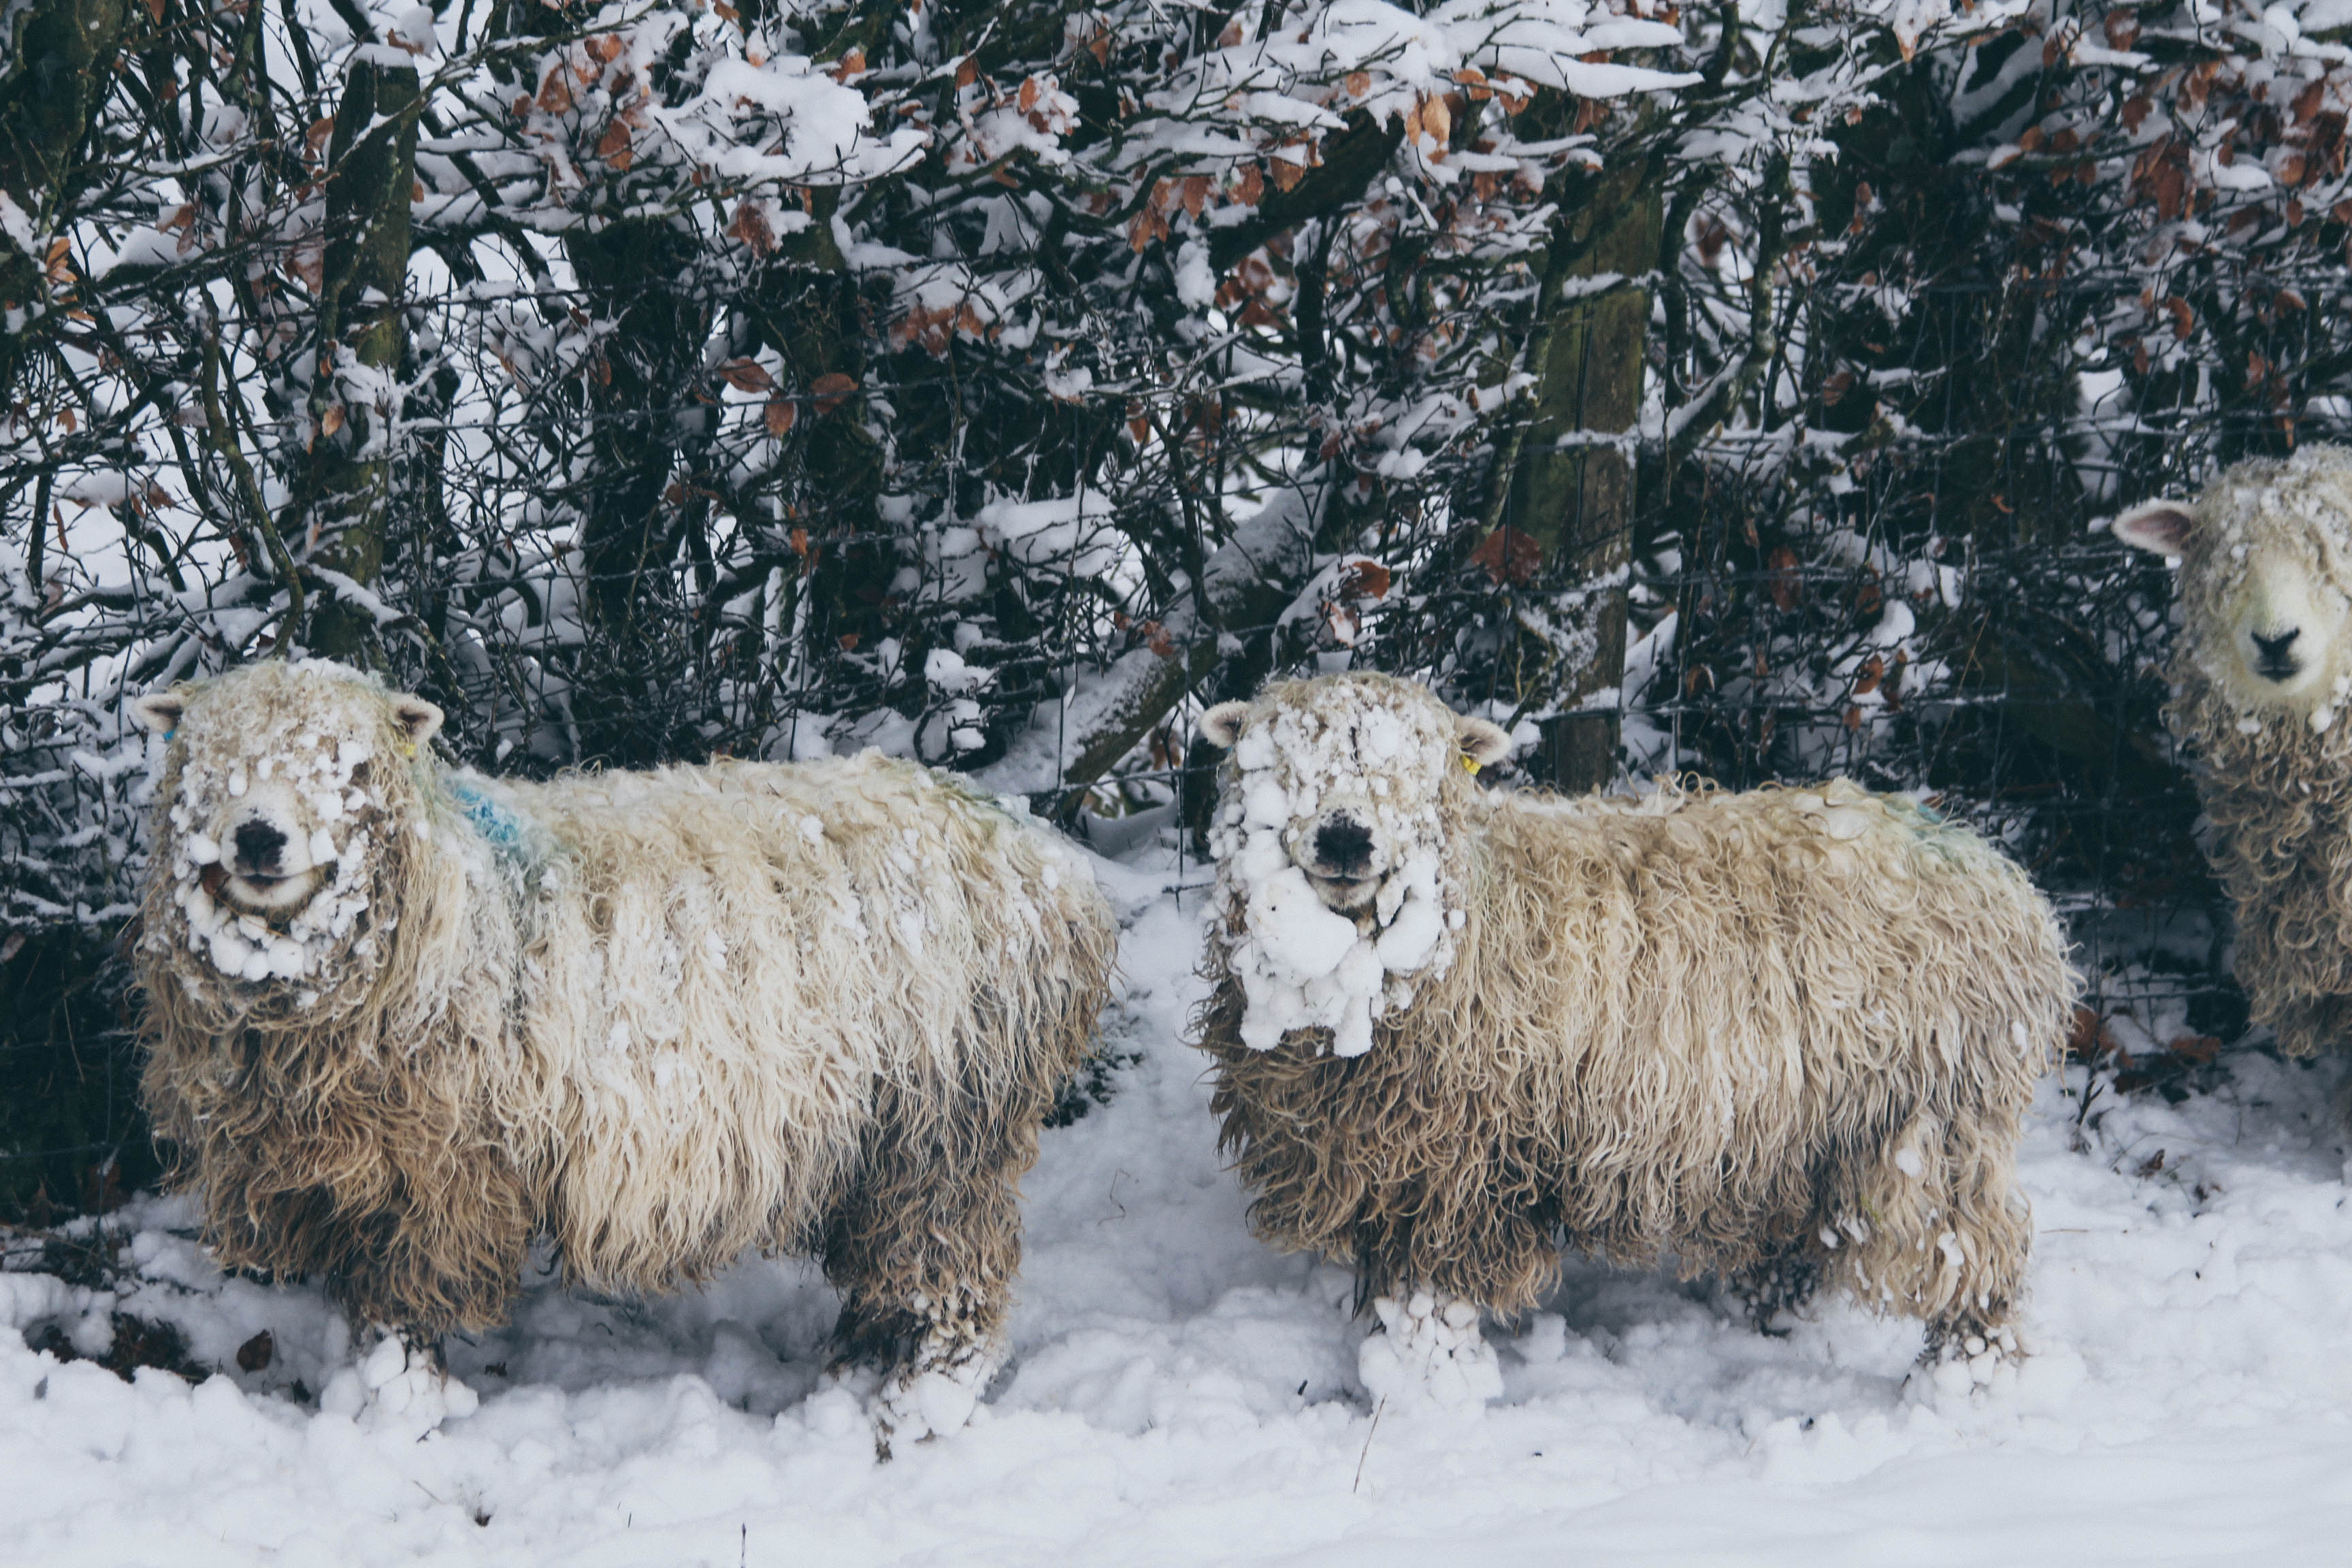 Sheep in the snow at Weddicott